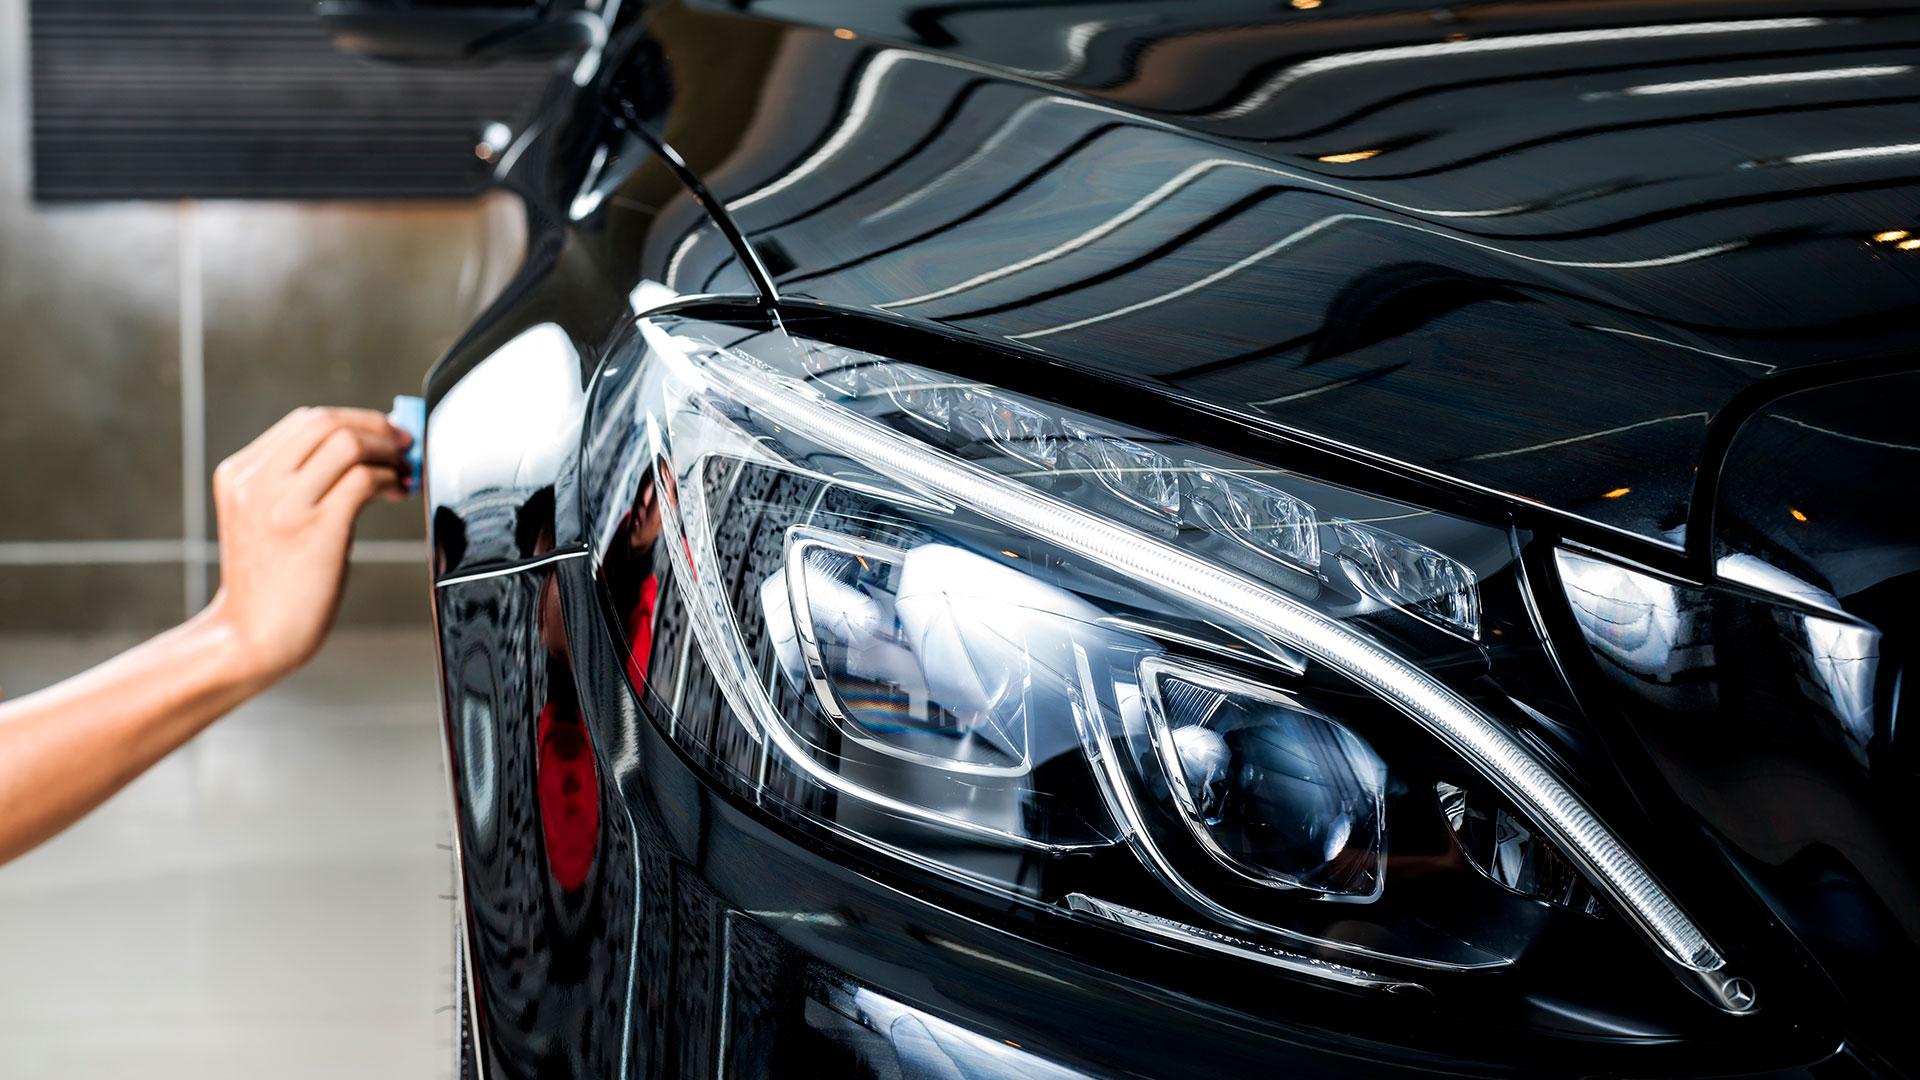 CWD CWD, Car Wash & Detailing, Car Wash, Detailing, Carro, Lavar Carro